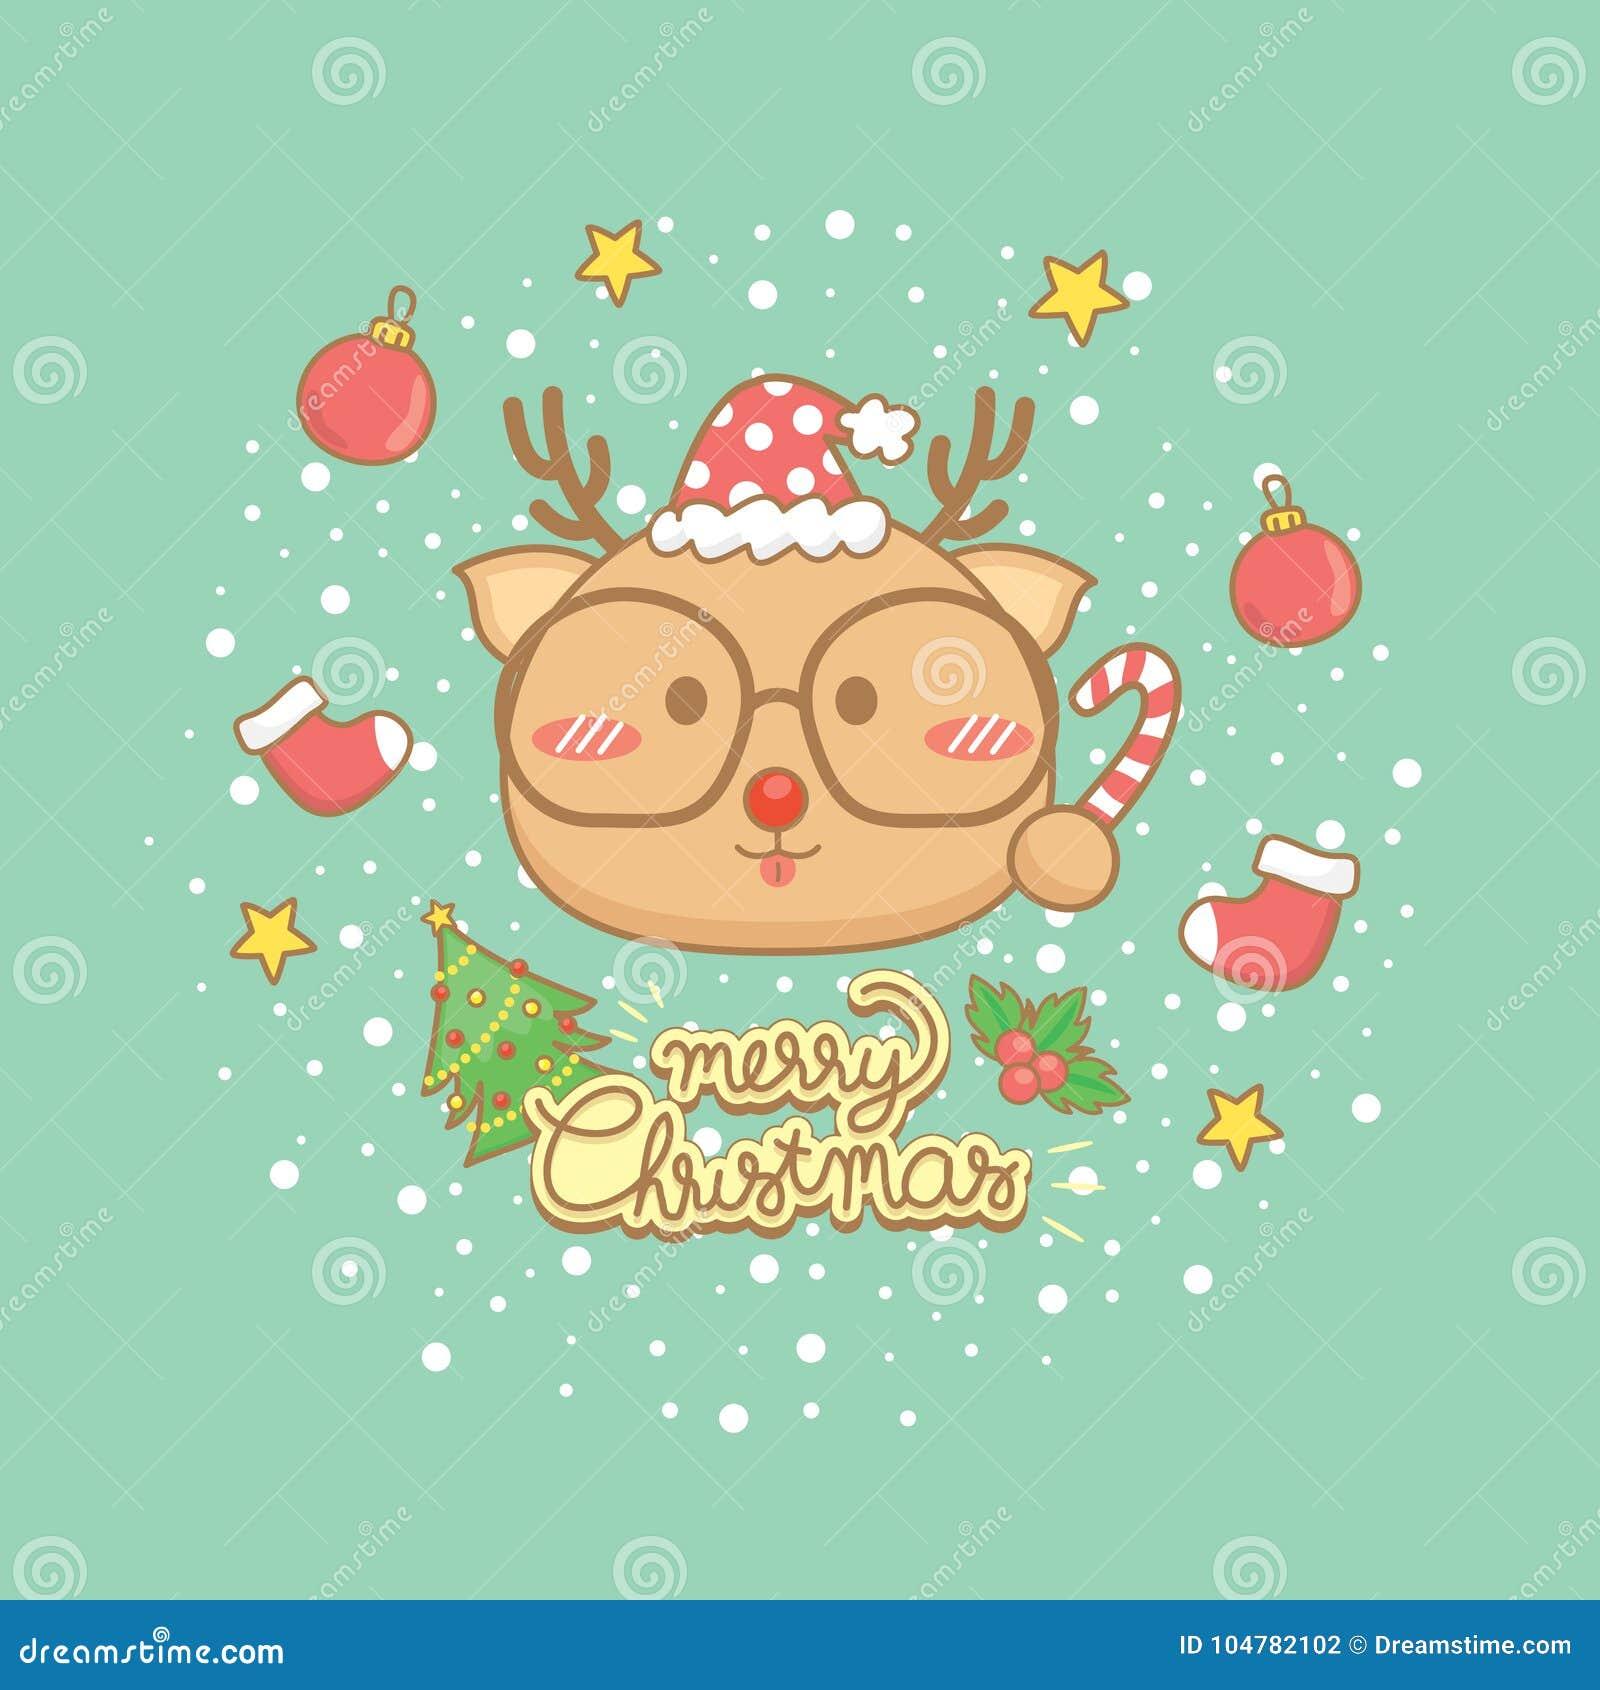 Christmas Celebration Cartoon Images.Christmas Celebration Greeting Card Set Stock Vector